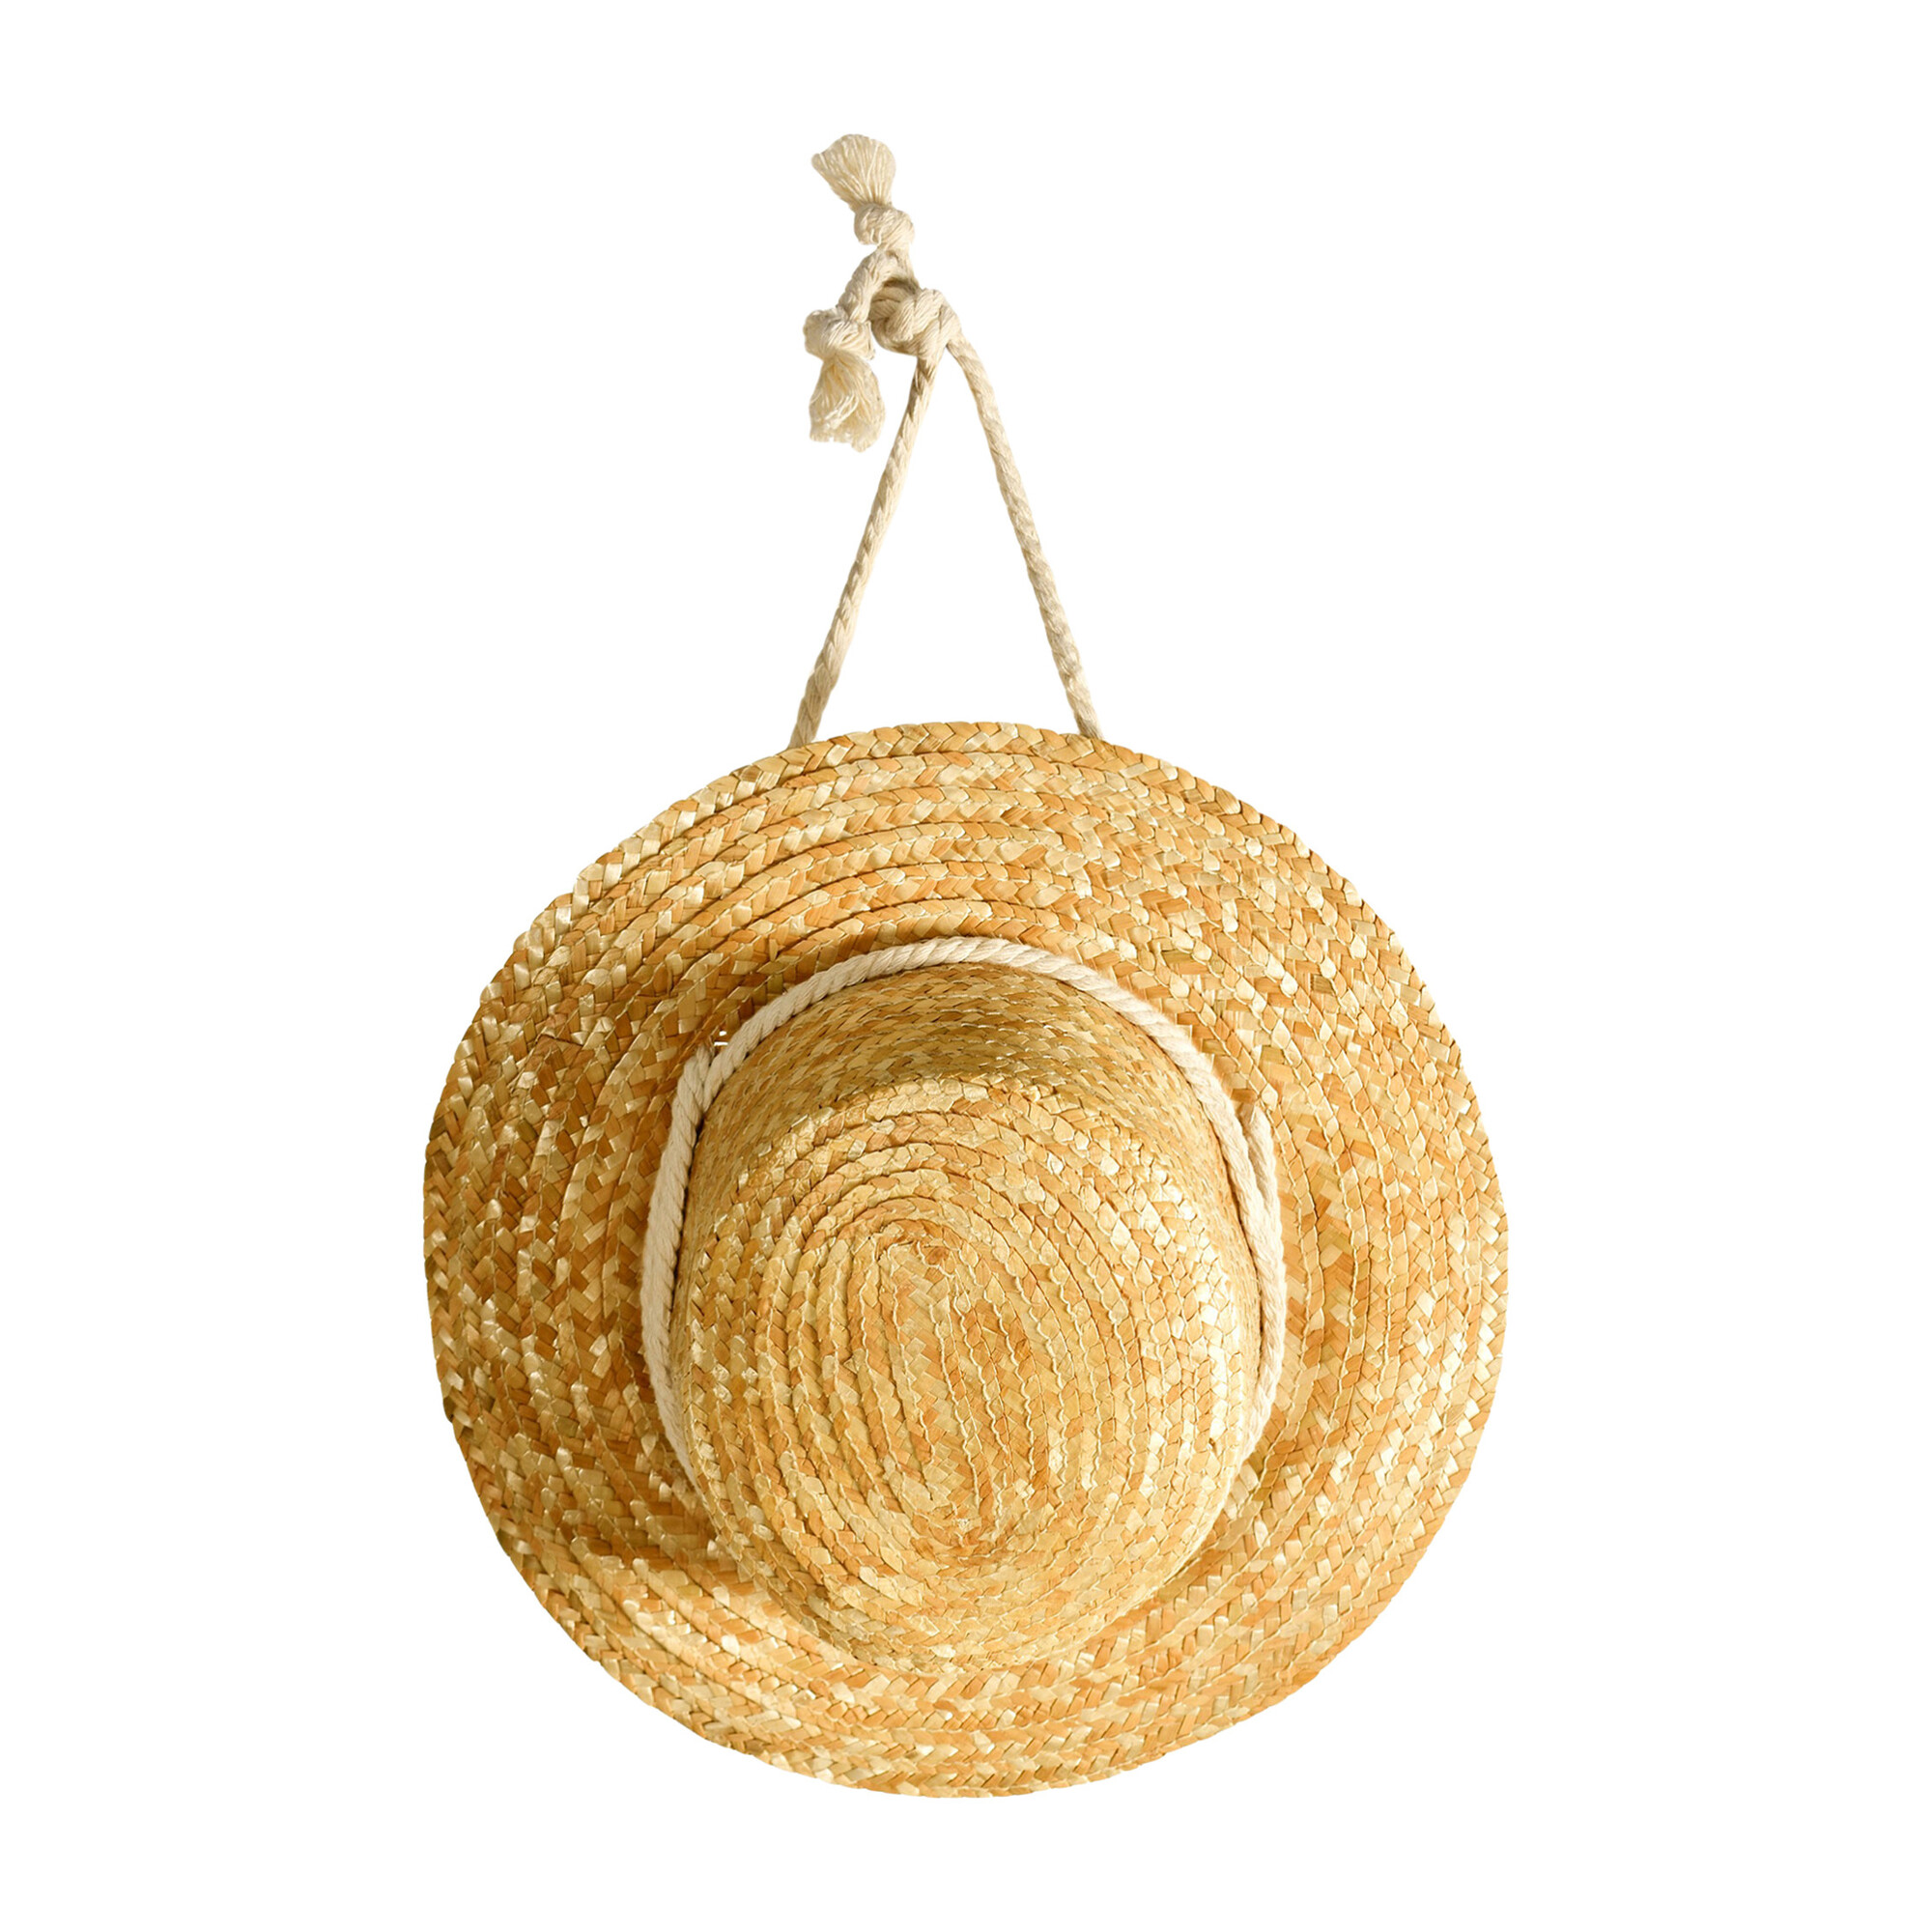 Straw Hat, Wood